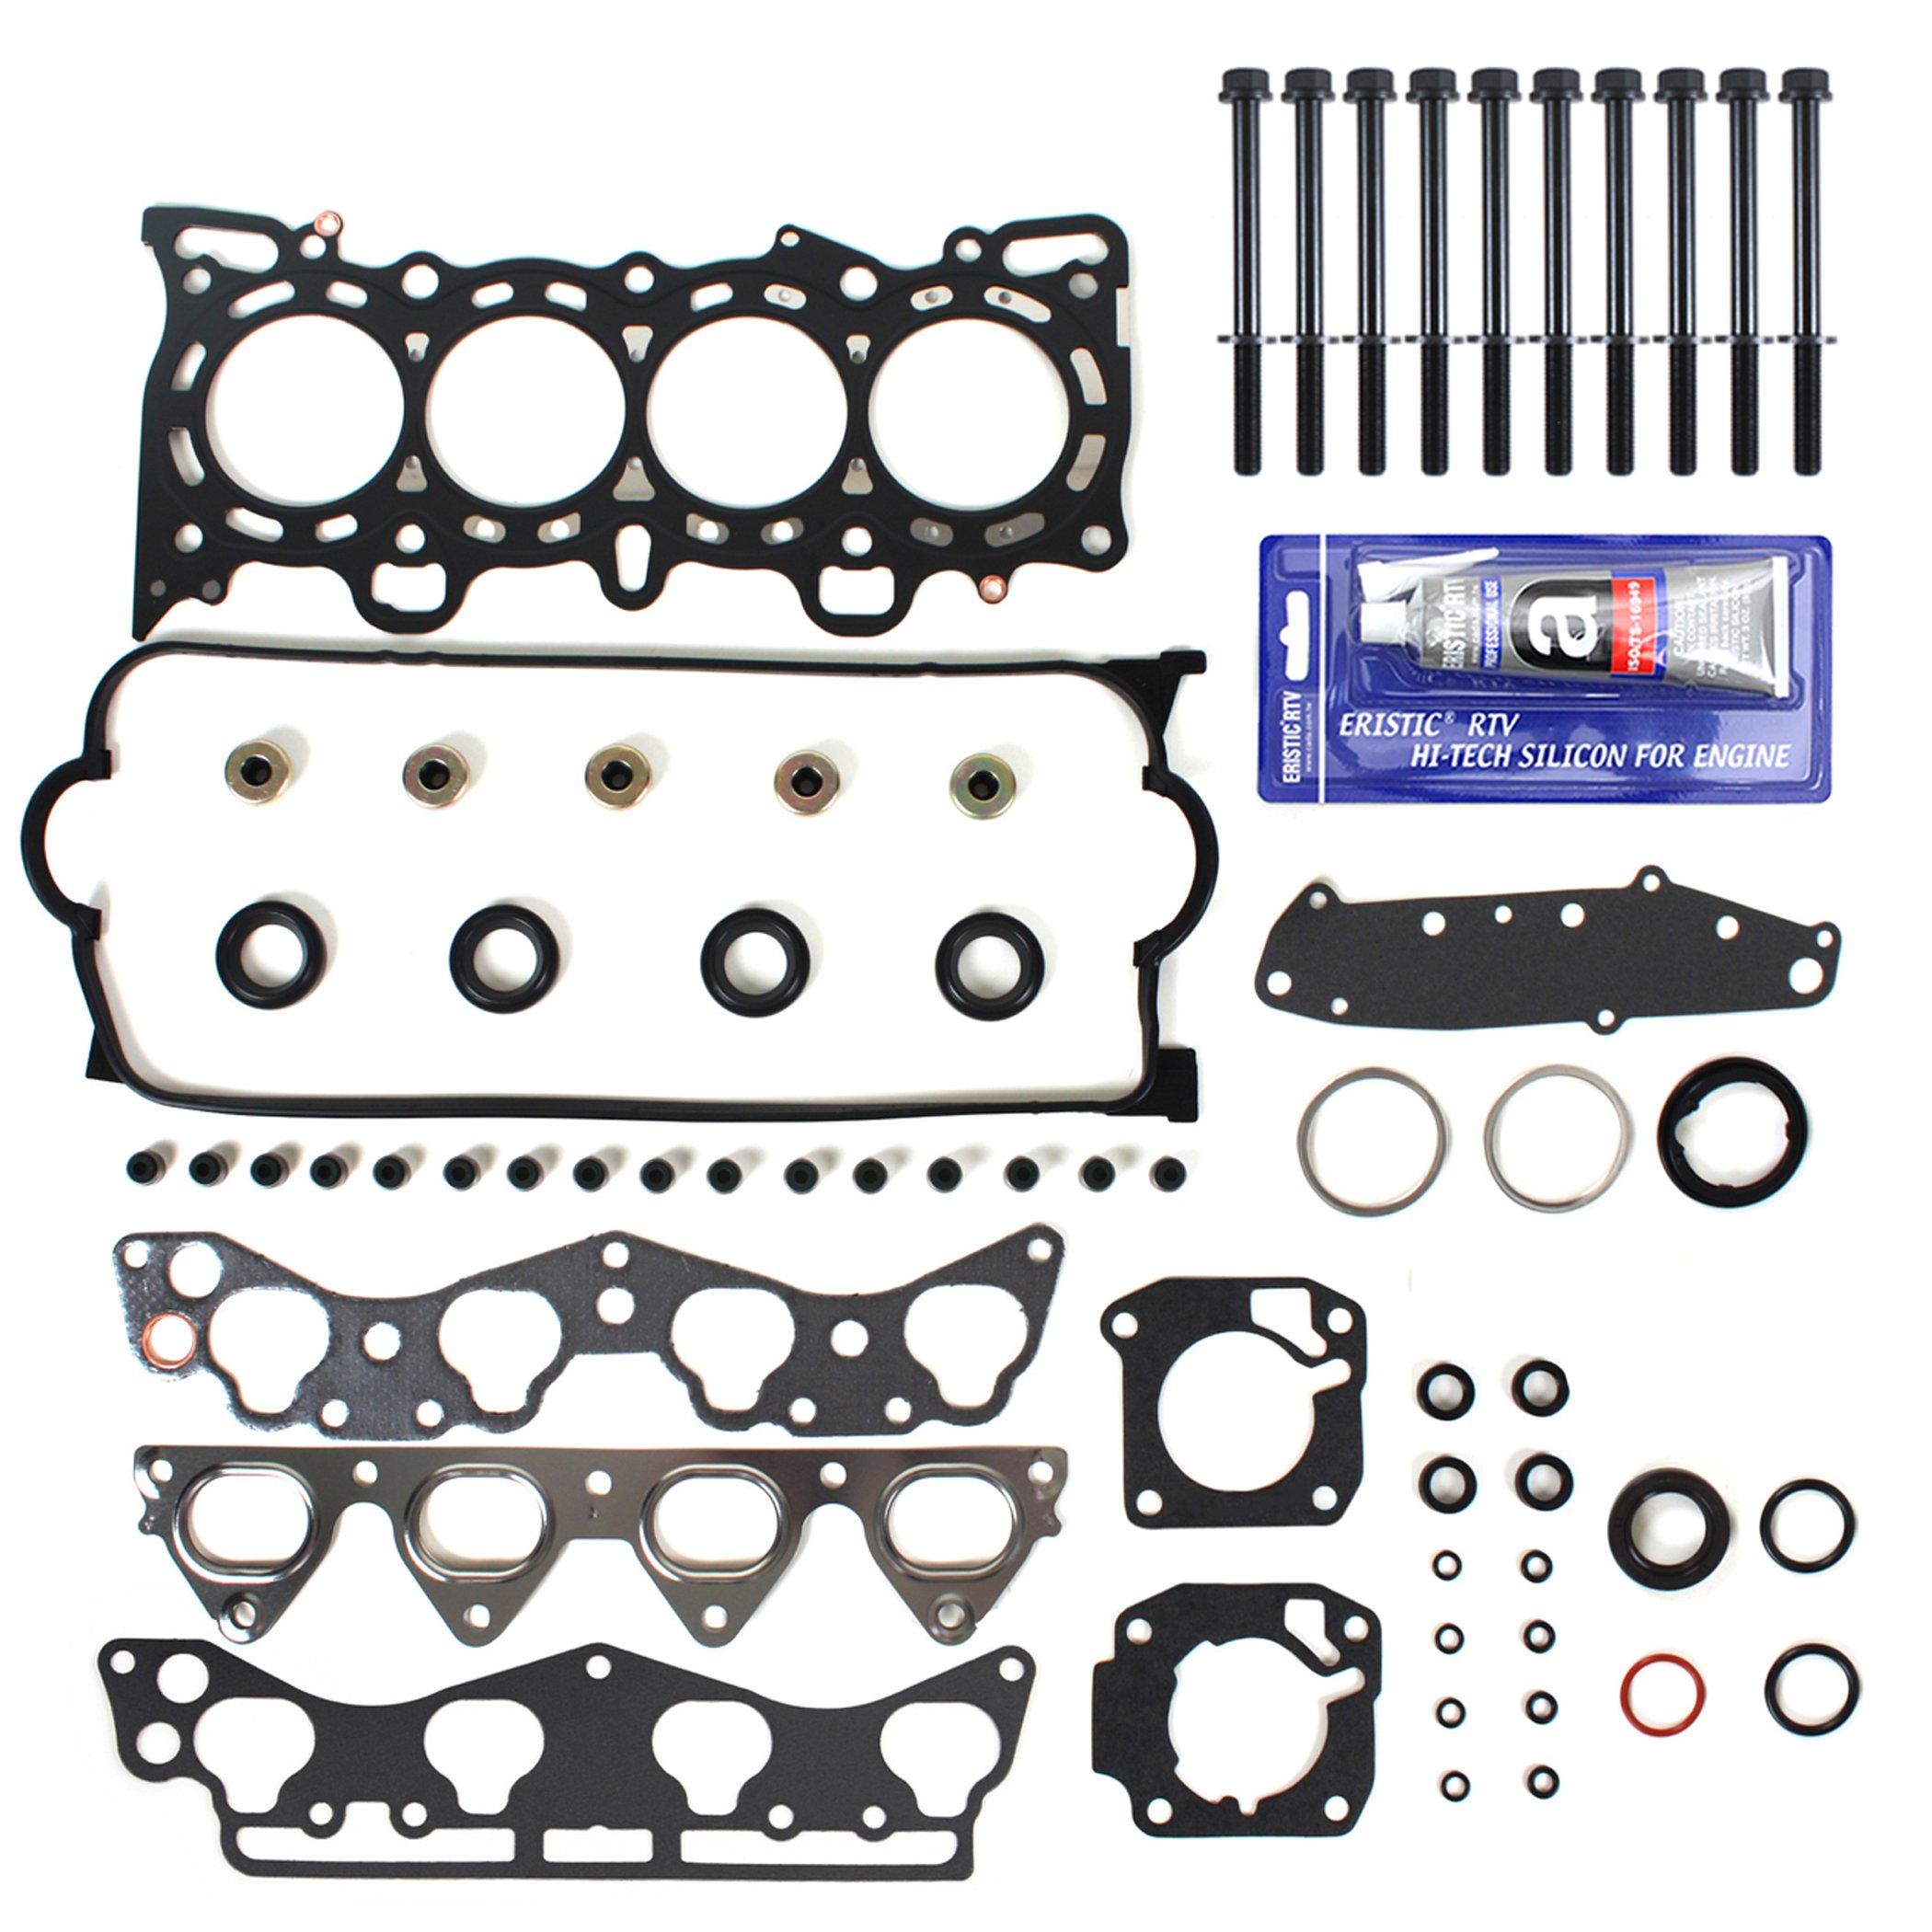 NEW HS1400HBSI MLS Head Gasket Set, Head Bolt Kit, & RTV Gasket Silicone for Honda Civic Del Sol 1.6L SOHC VTEC D16Y D16Y5 D16Y7 D16Y8